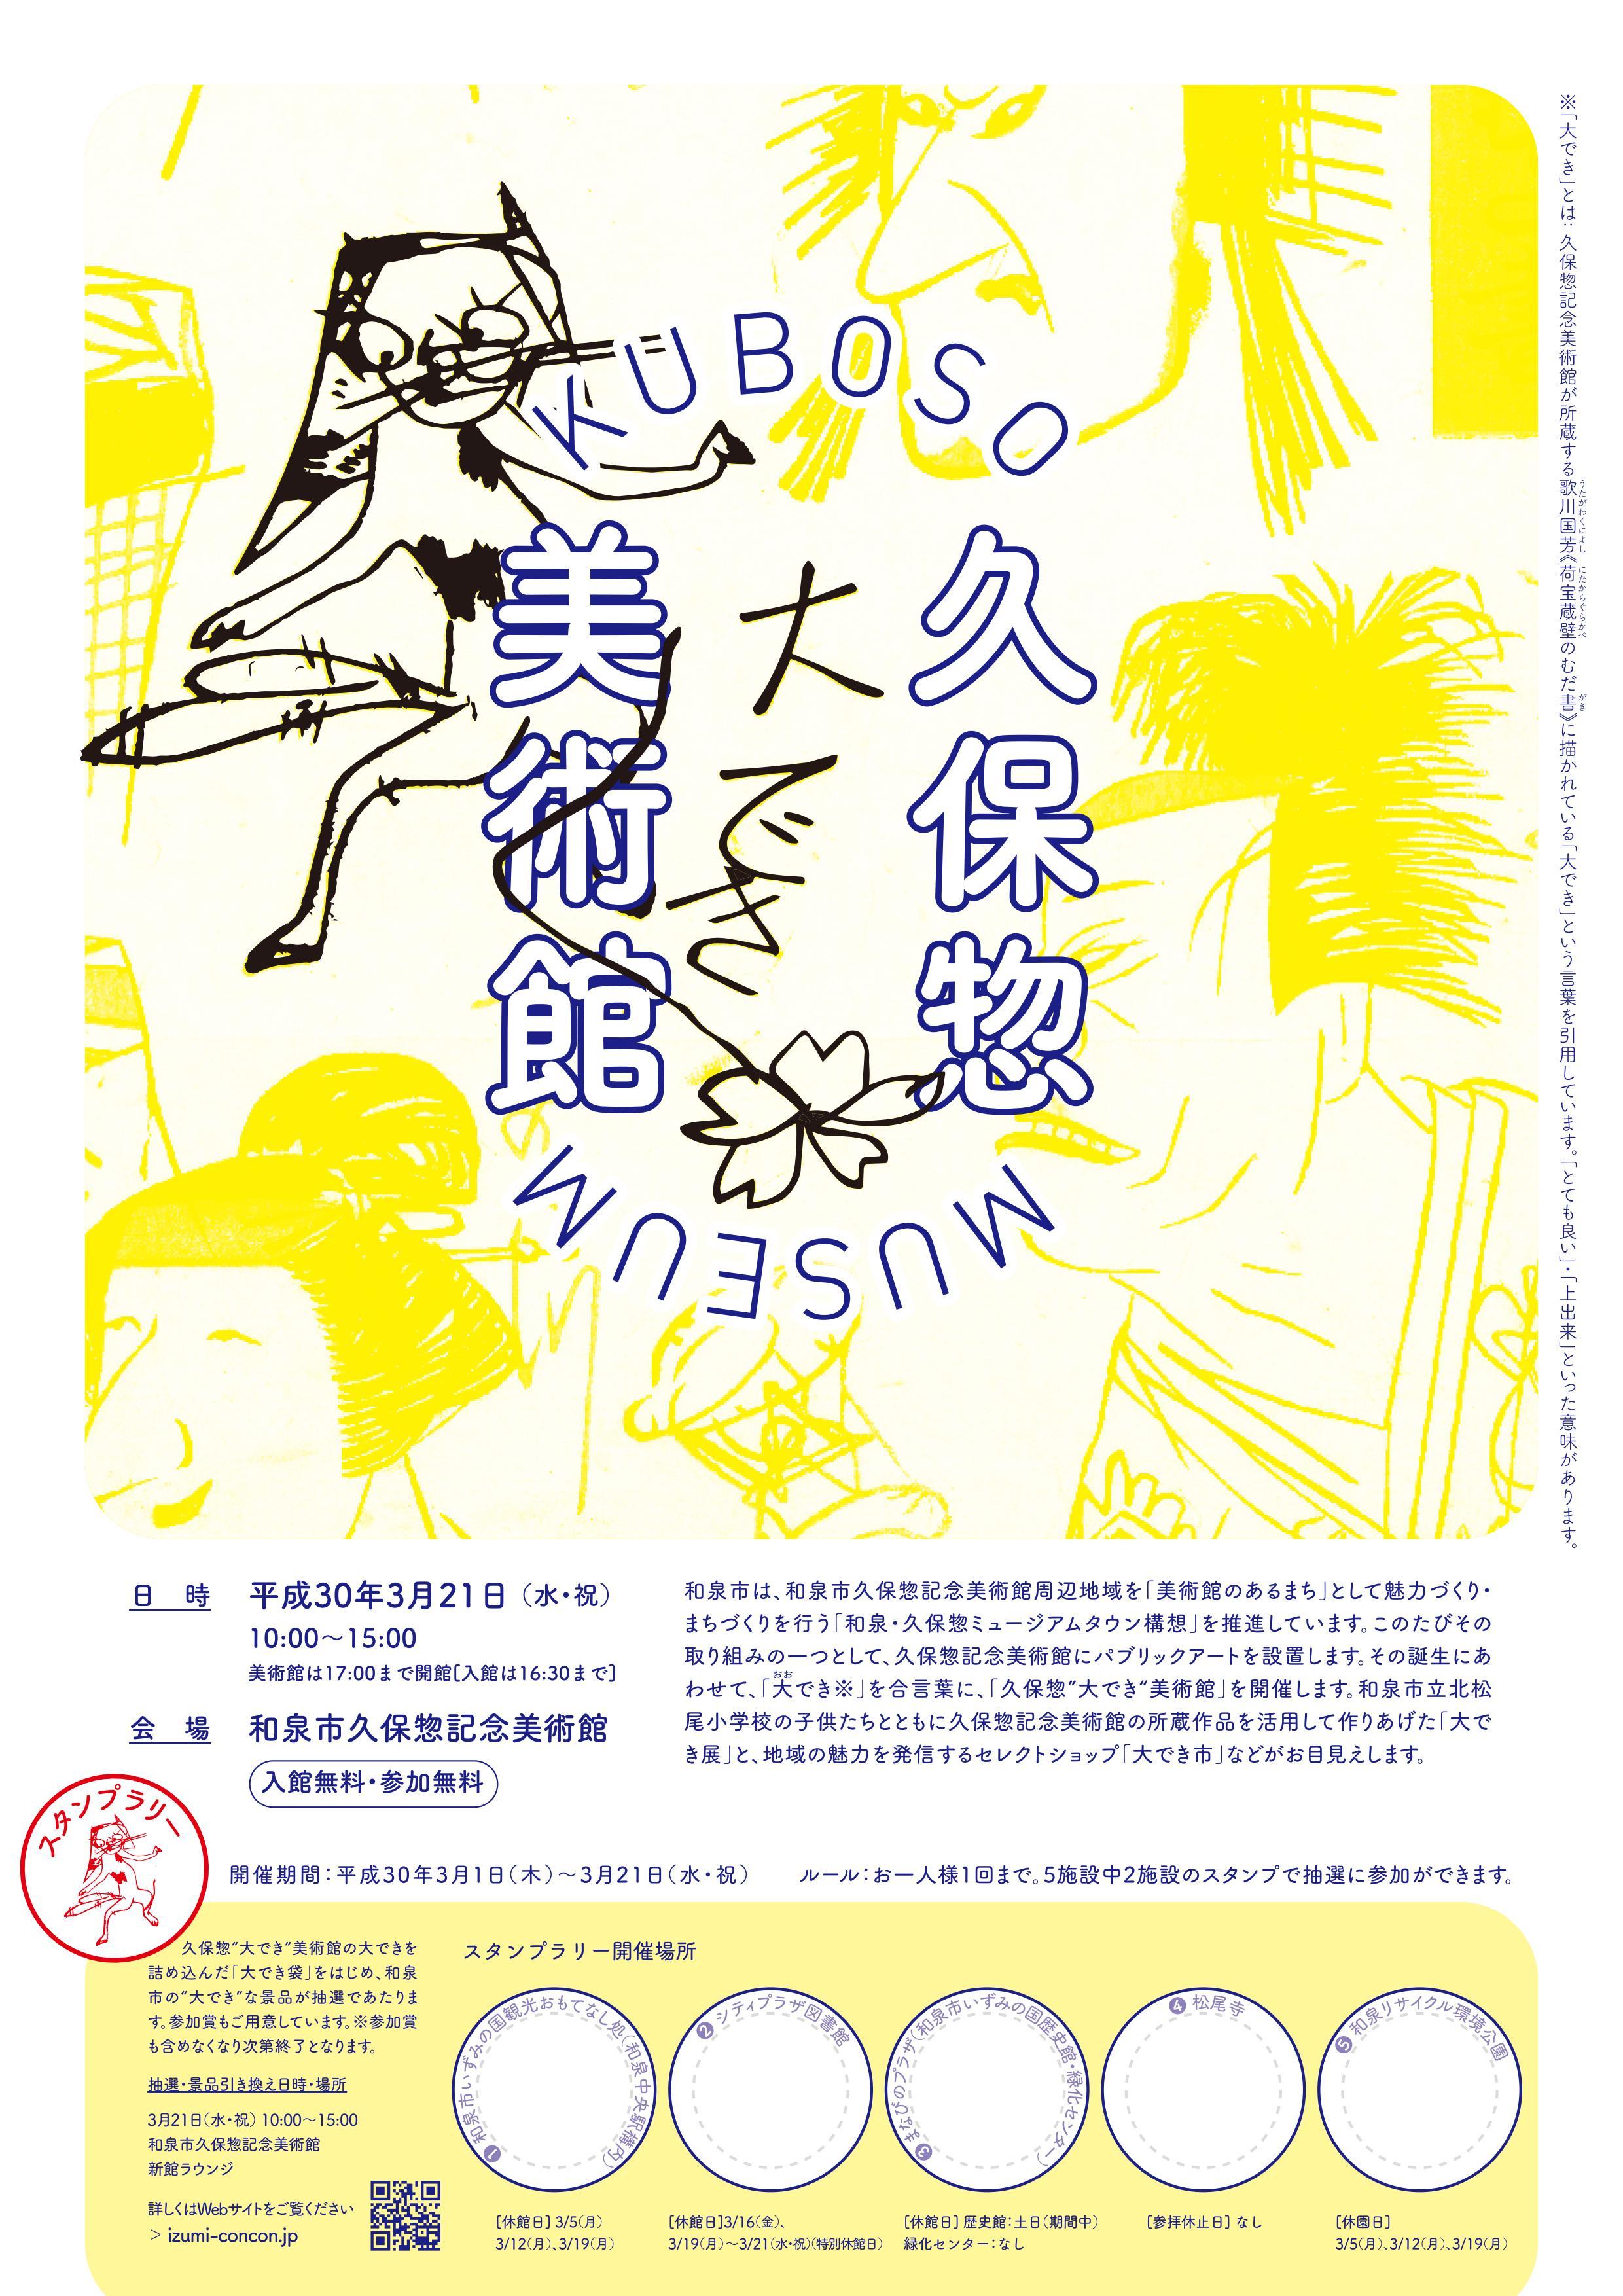 平成30年3月21日(水・祝)「久保惣大でき美術館」開催!!